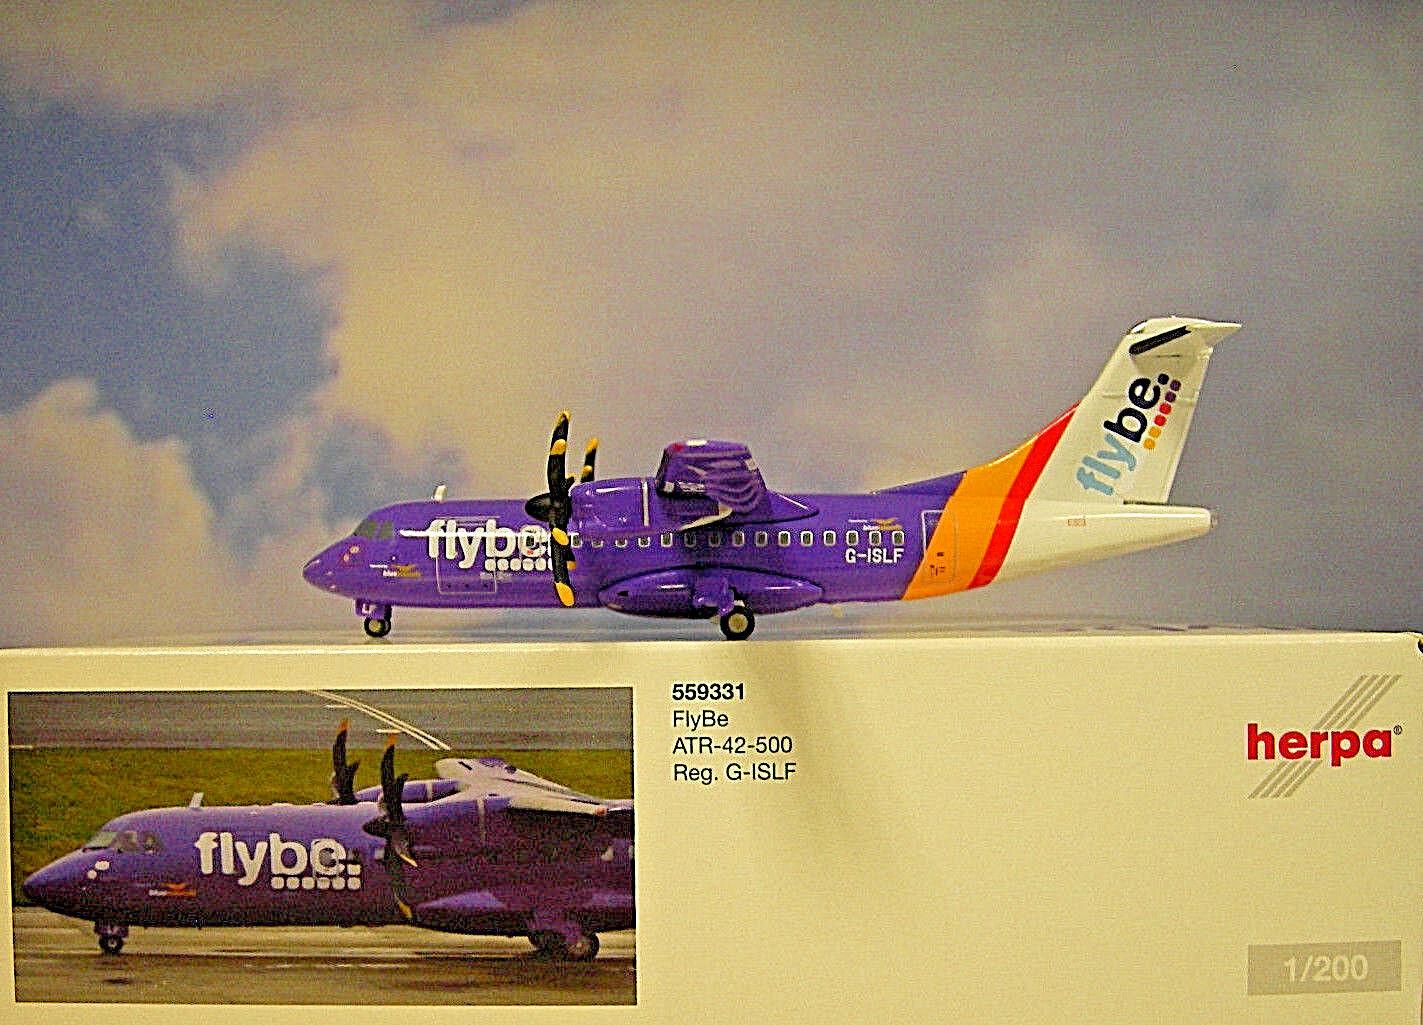 Herpa Wings 1 200 ATR - 42 - 500 Flybe G-islf 556651